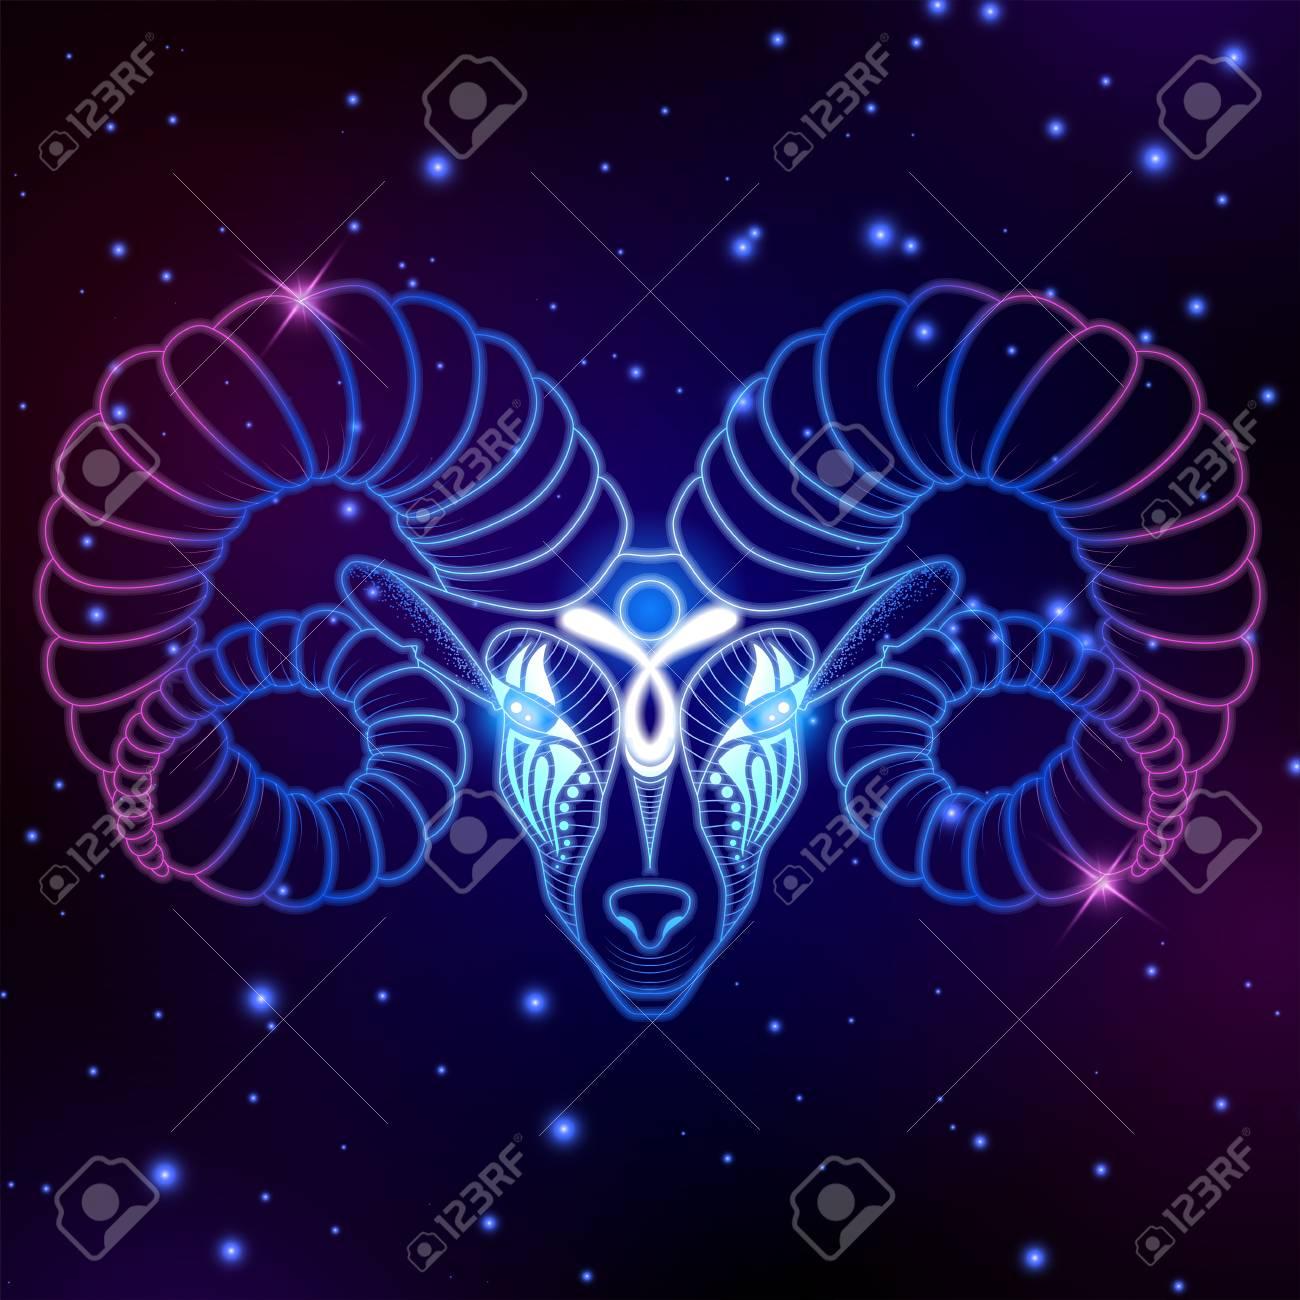 images of aries horoscope symbol